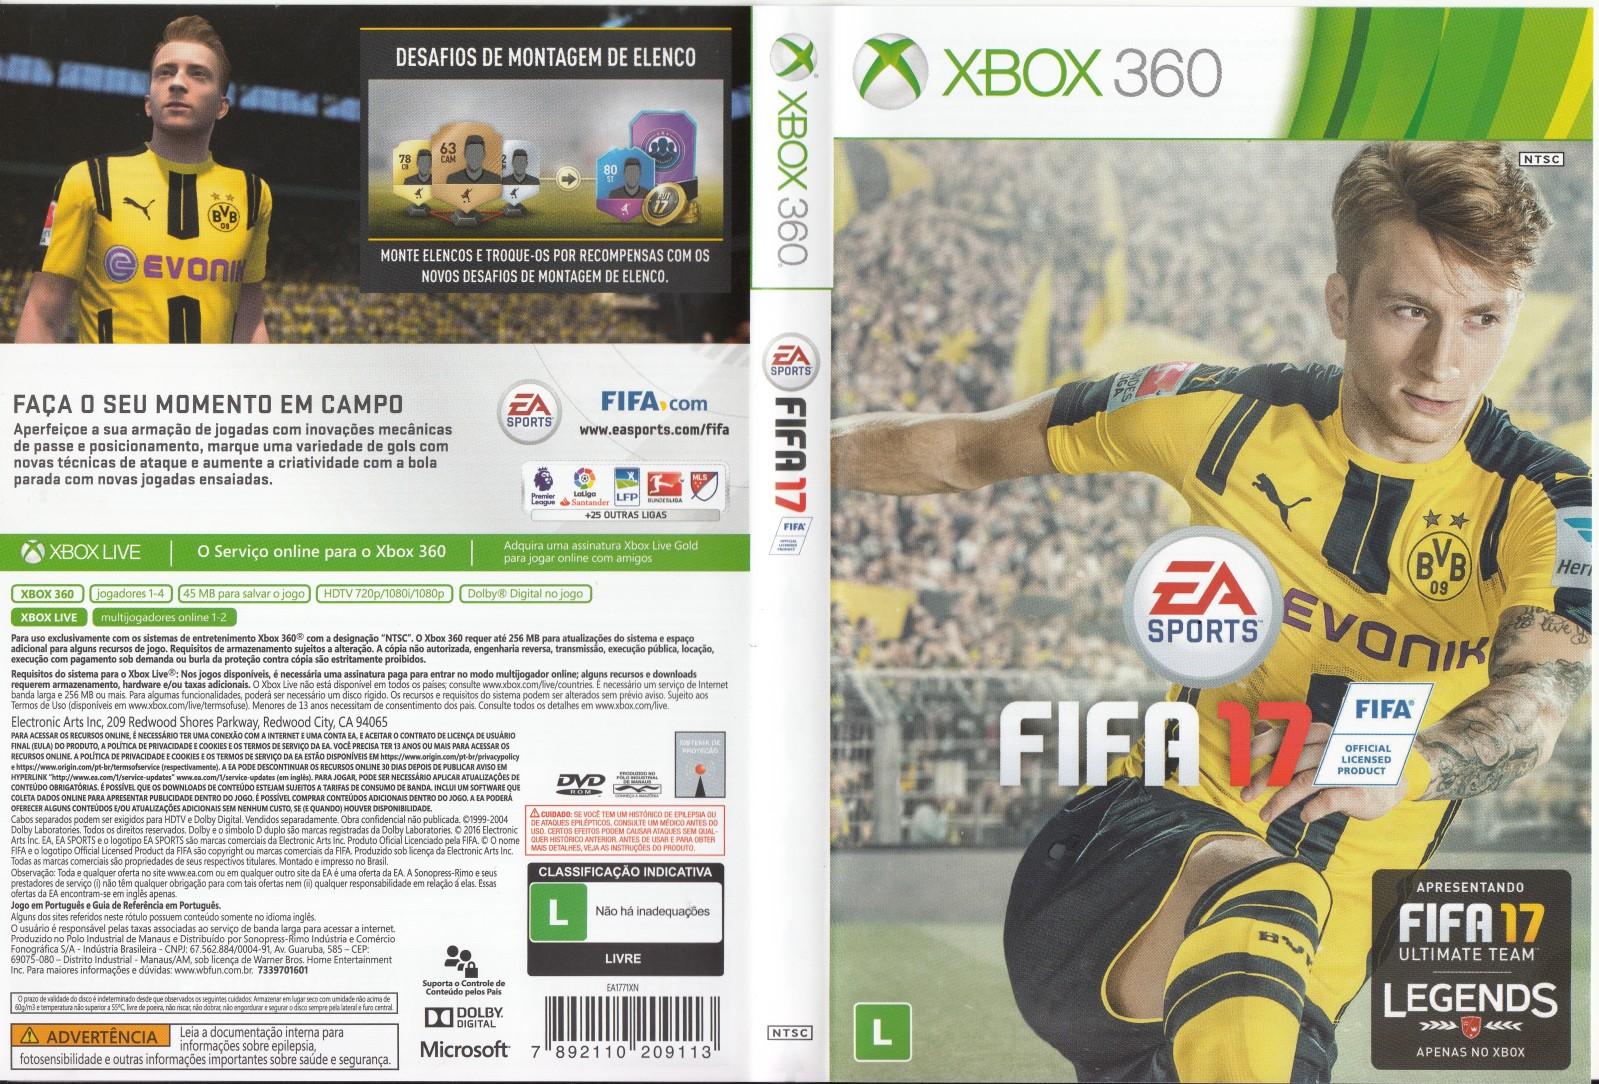 Fifa 17 (2016) Cover Xbox 360 - LT 3.0 - JTAG/RGH Torrent